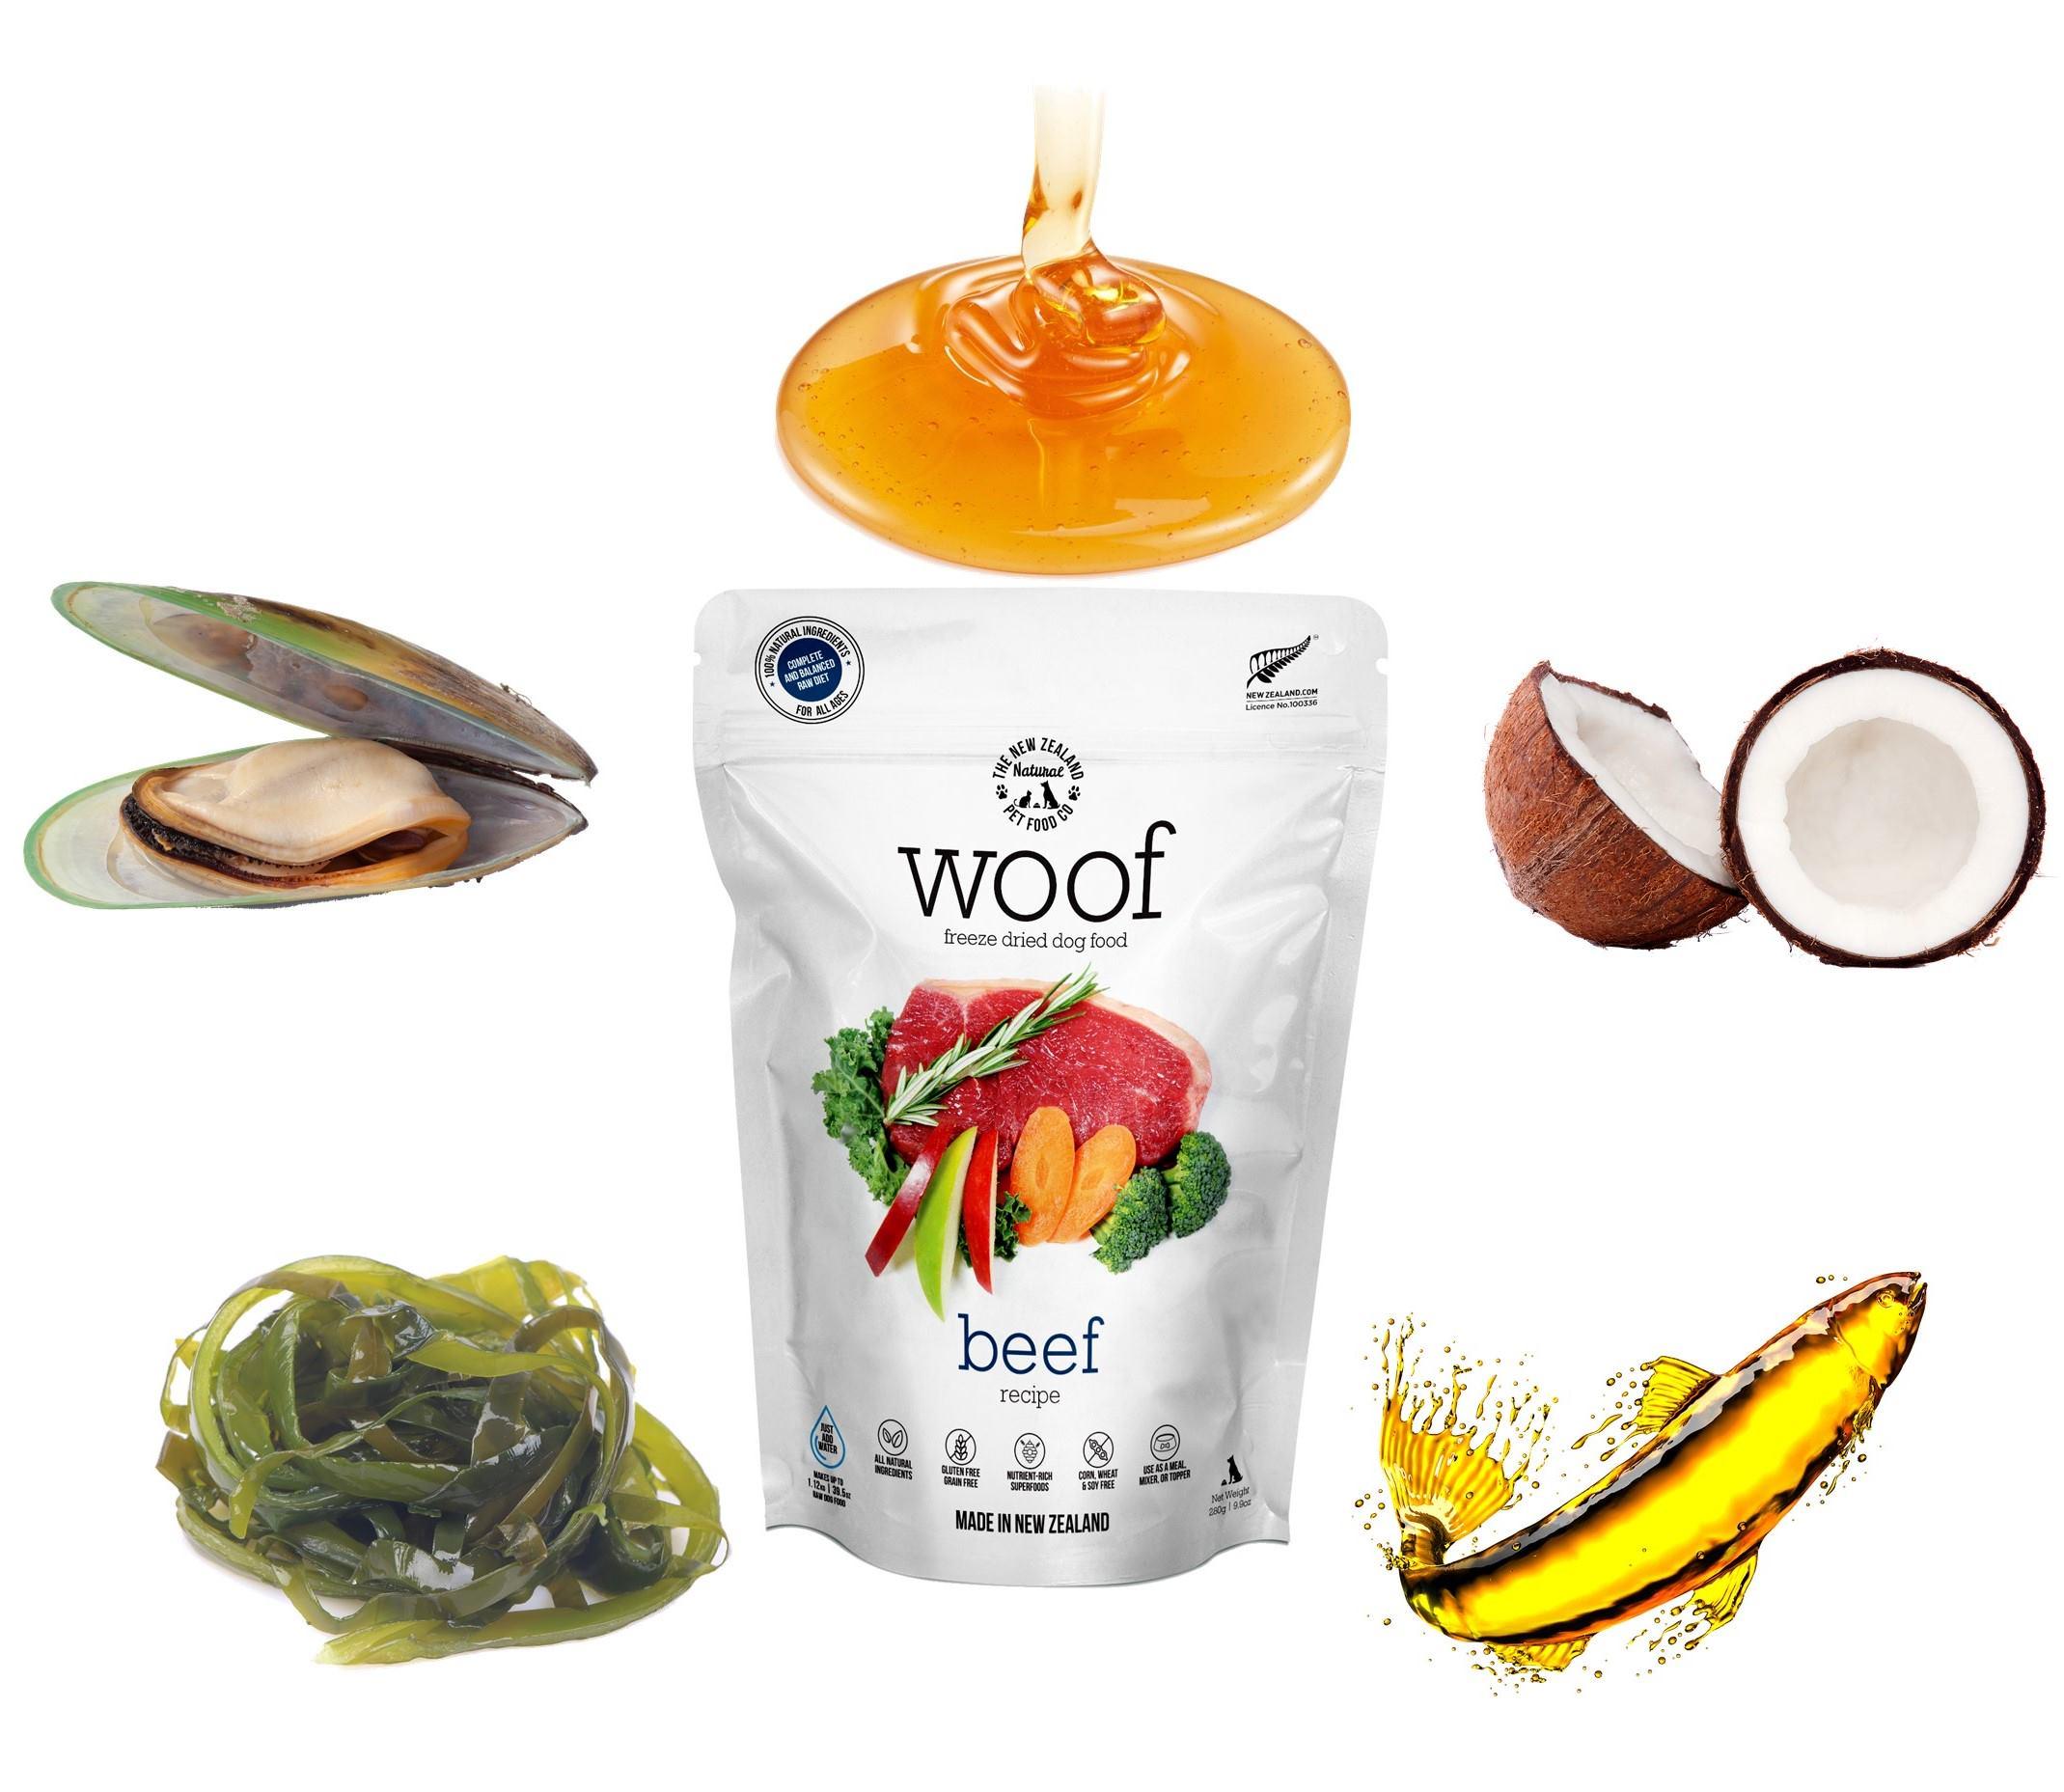 WOOF 愛犬の健康をサポートする栄養成分が充実│無添加ドッグフードのBAUWAW公式通販